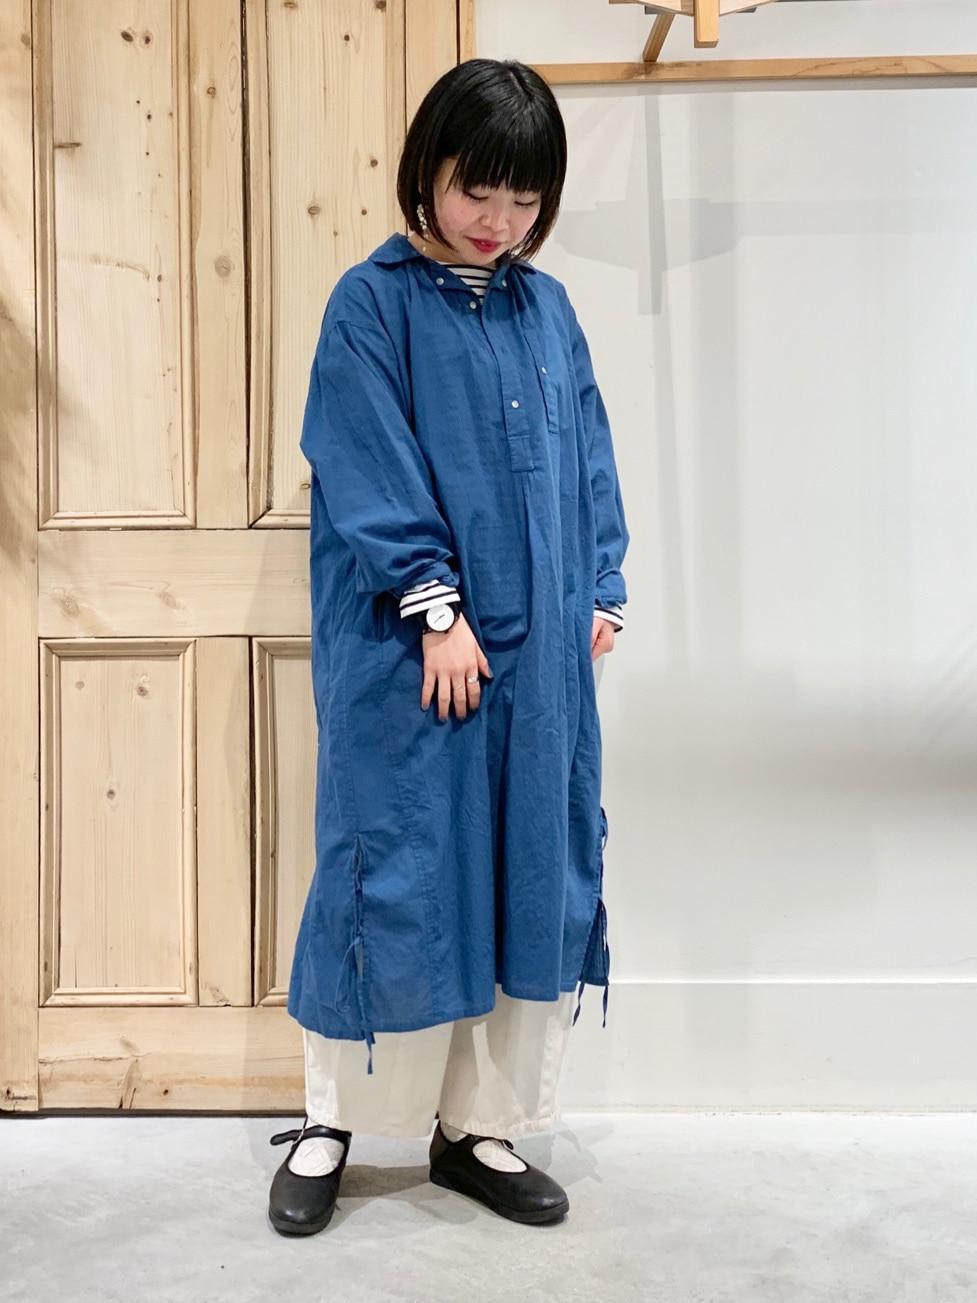 Malle chambre de charme 調布パルコ 身長:153cm 2021.02.05